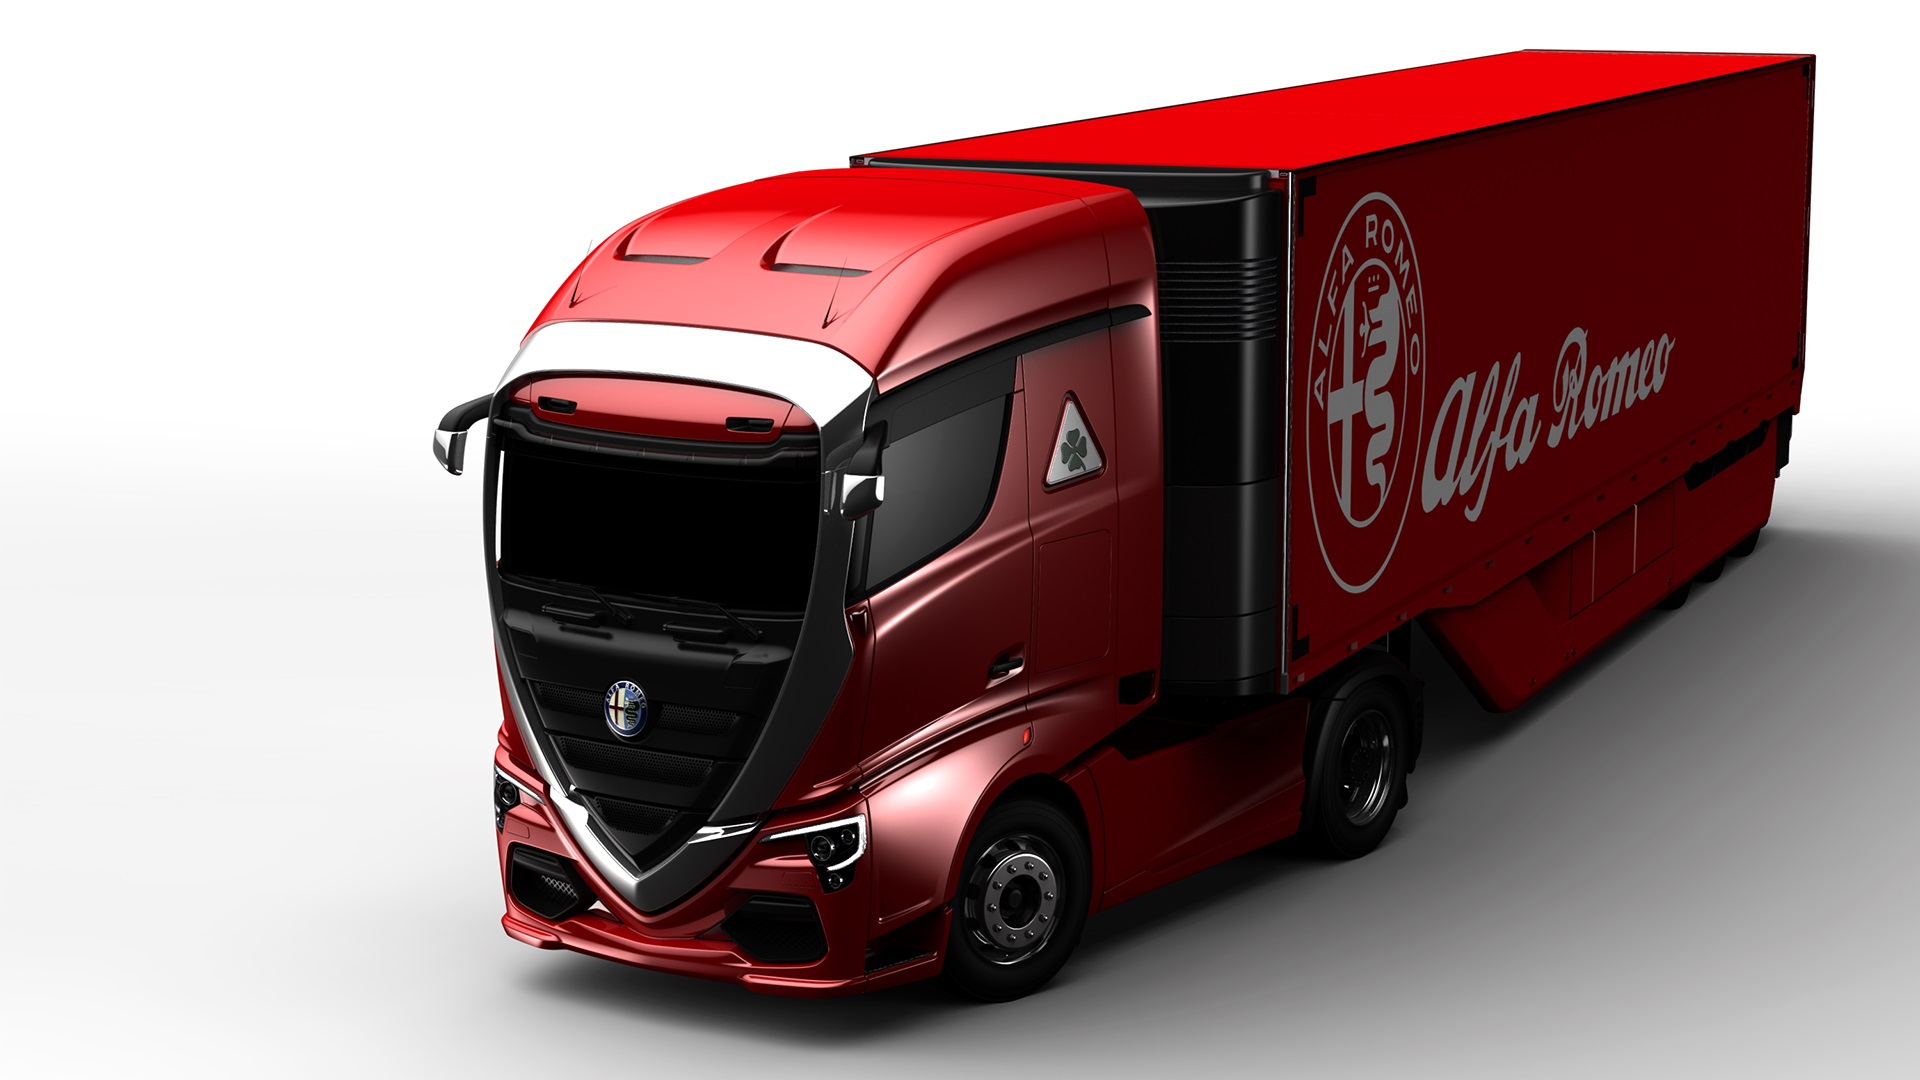 Alfa Romeo Truck concept rendering (5)